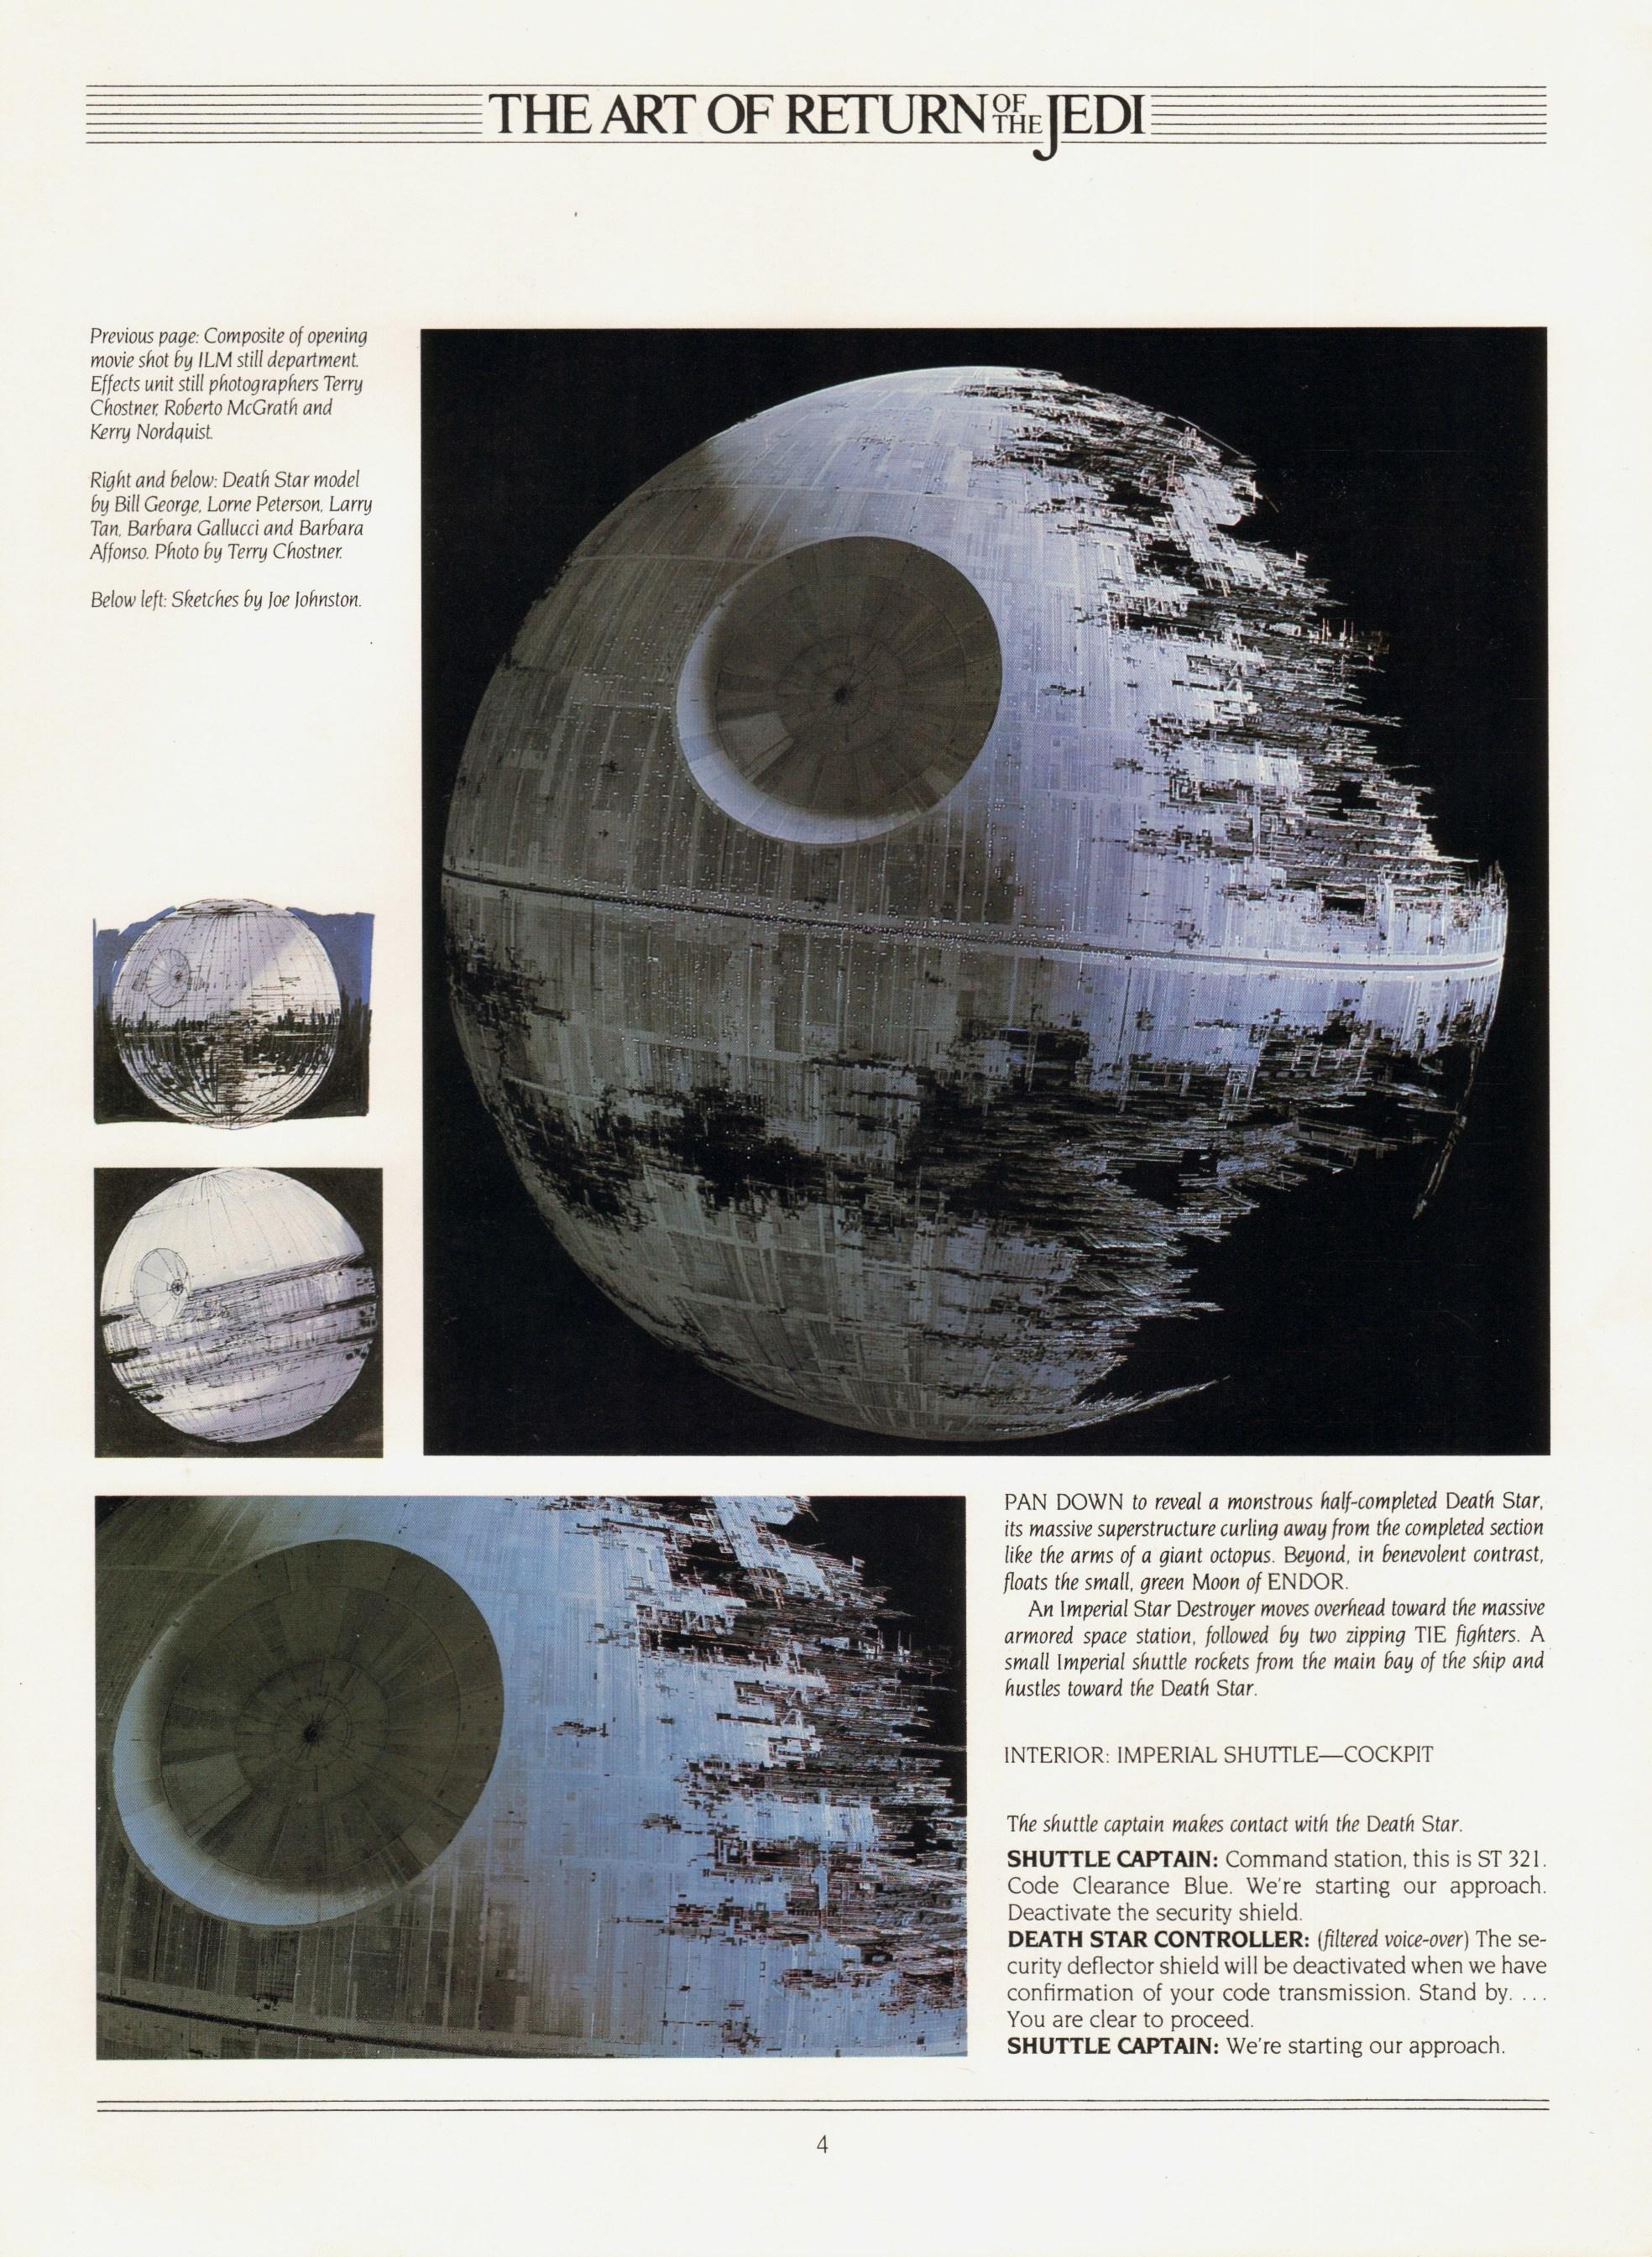 Art of Return of the Jedi (b0bafett_Empire)-p004